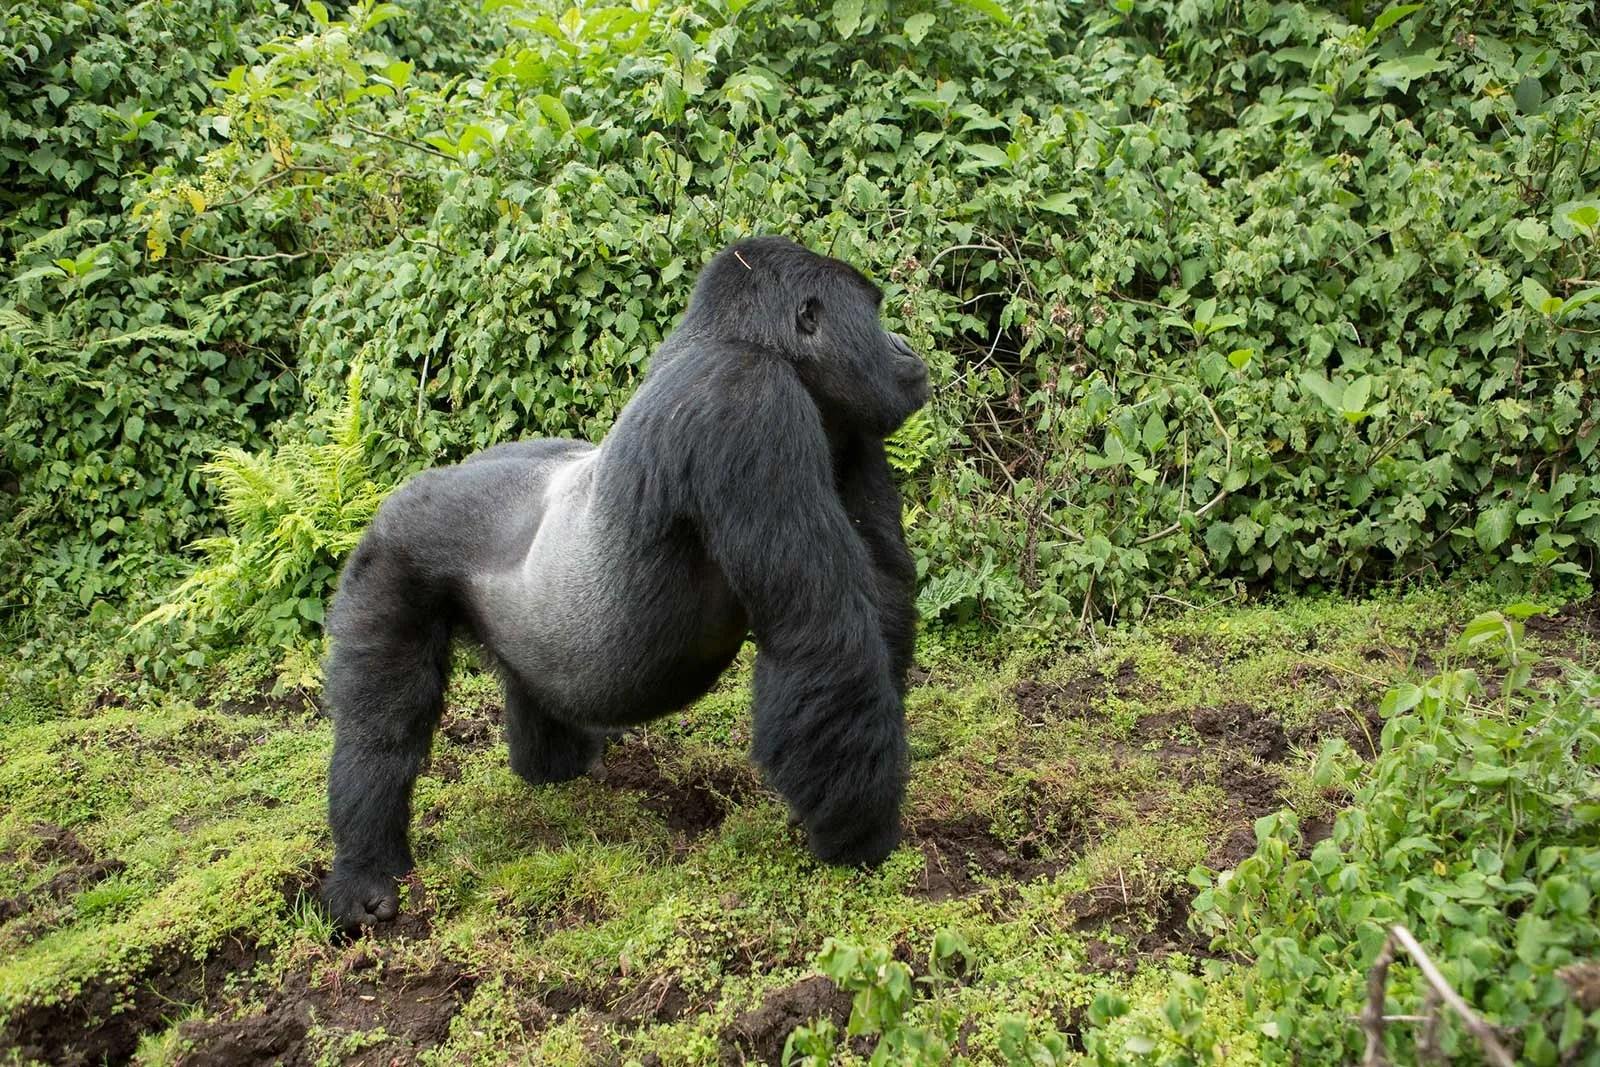 Silverback mountain gorilla in Rwanda